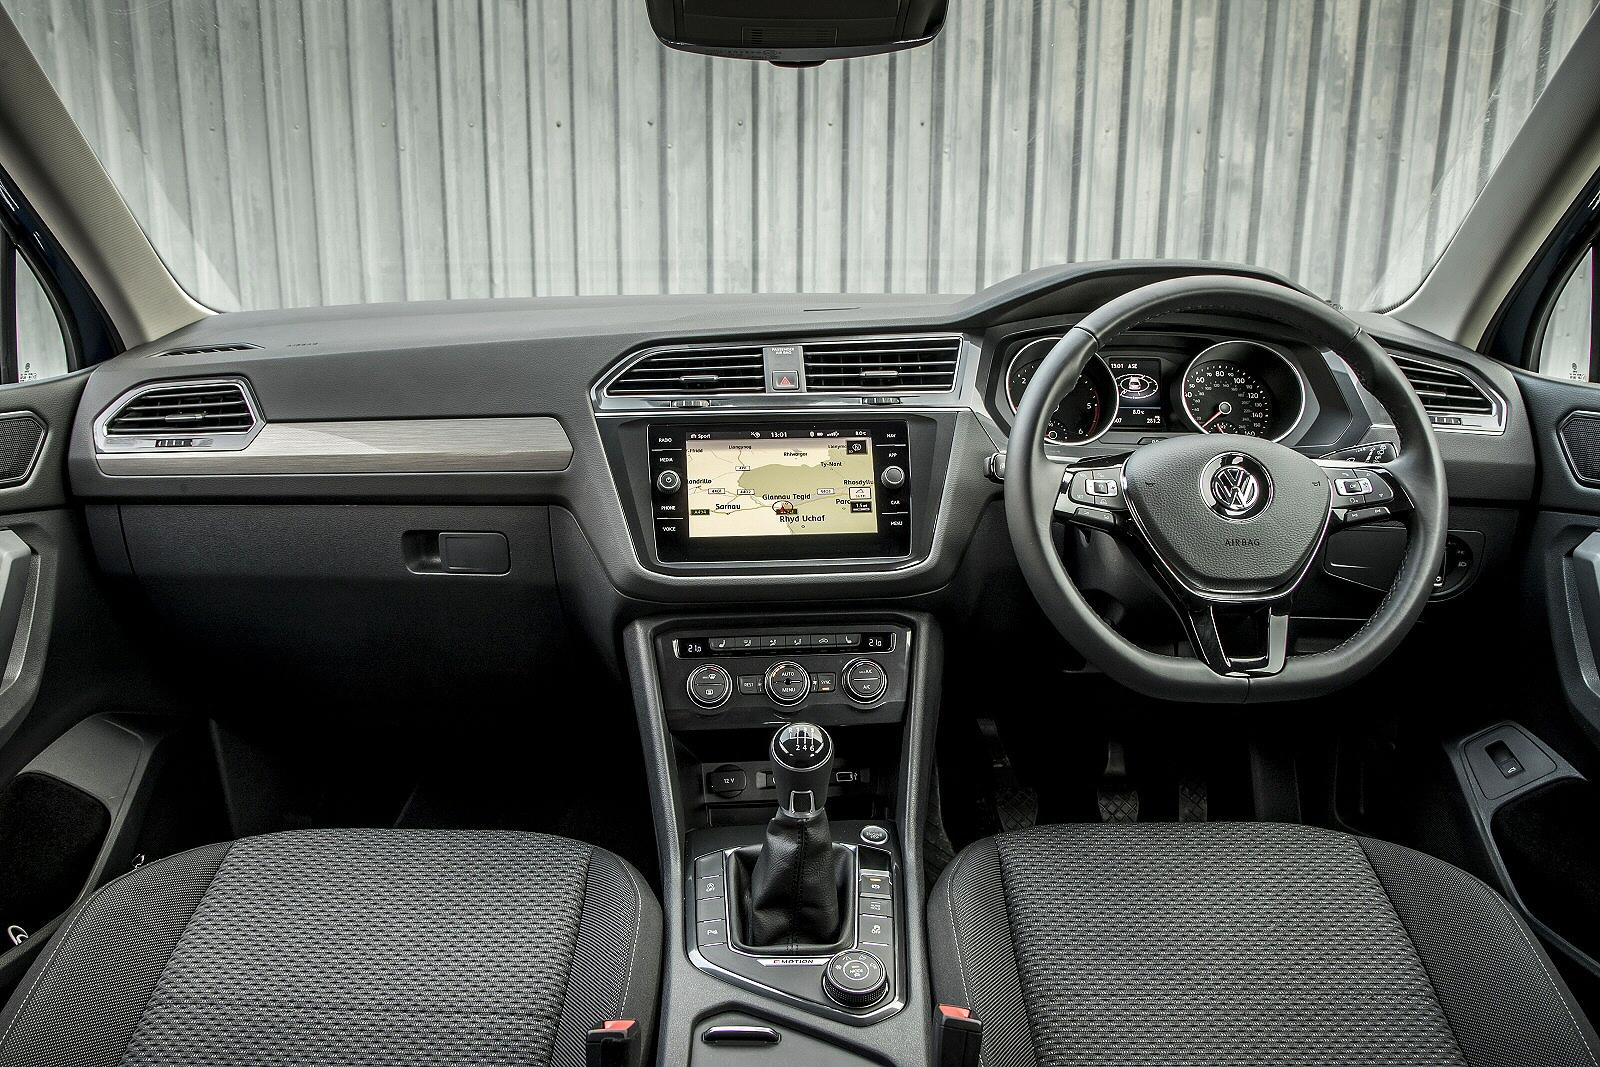 Volkswagen TIGUAN ALLSPACE 2.0 TDI Match 5dr